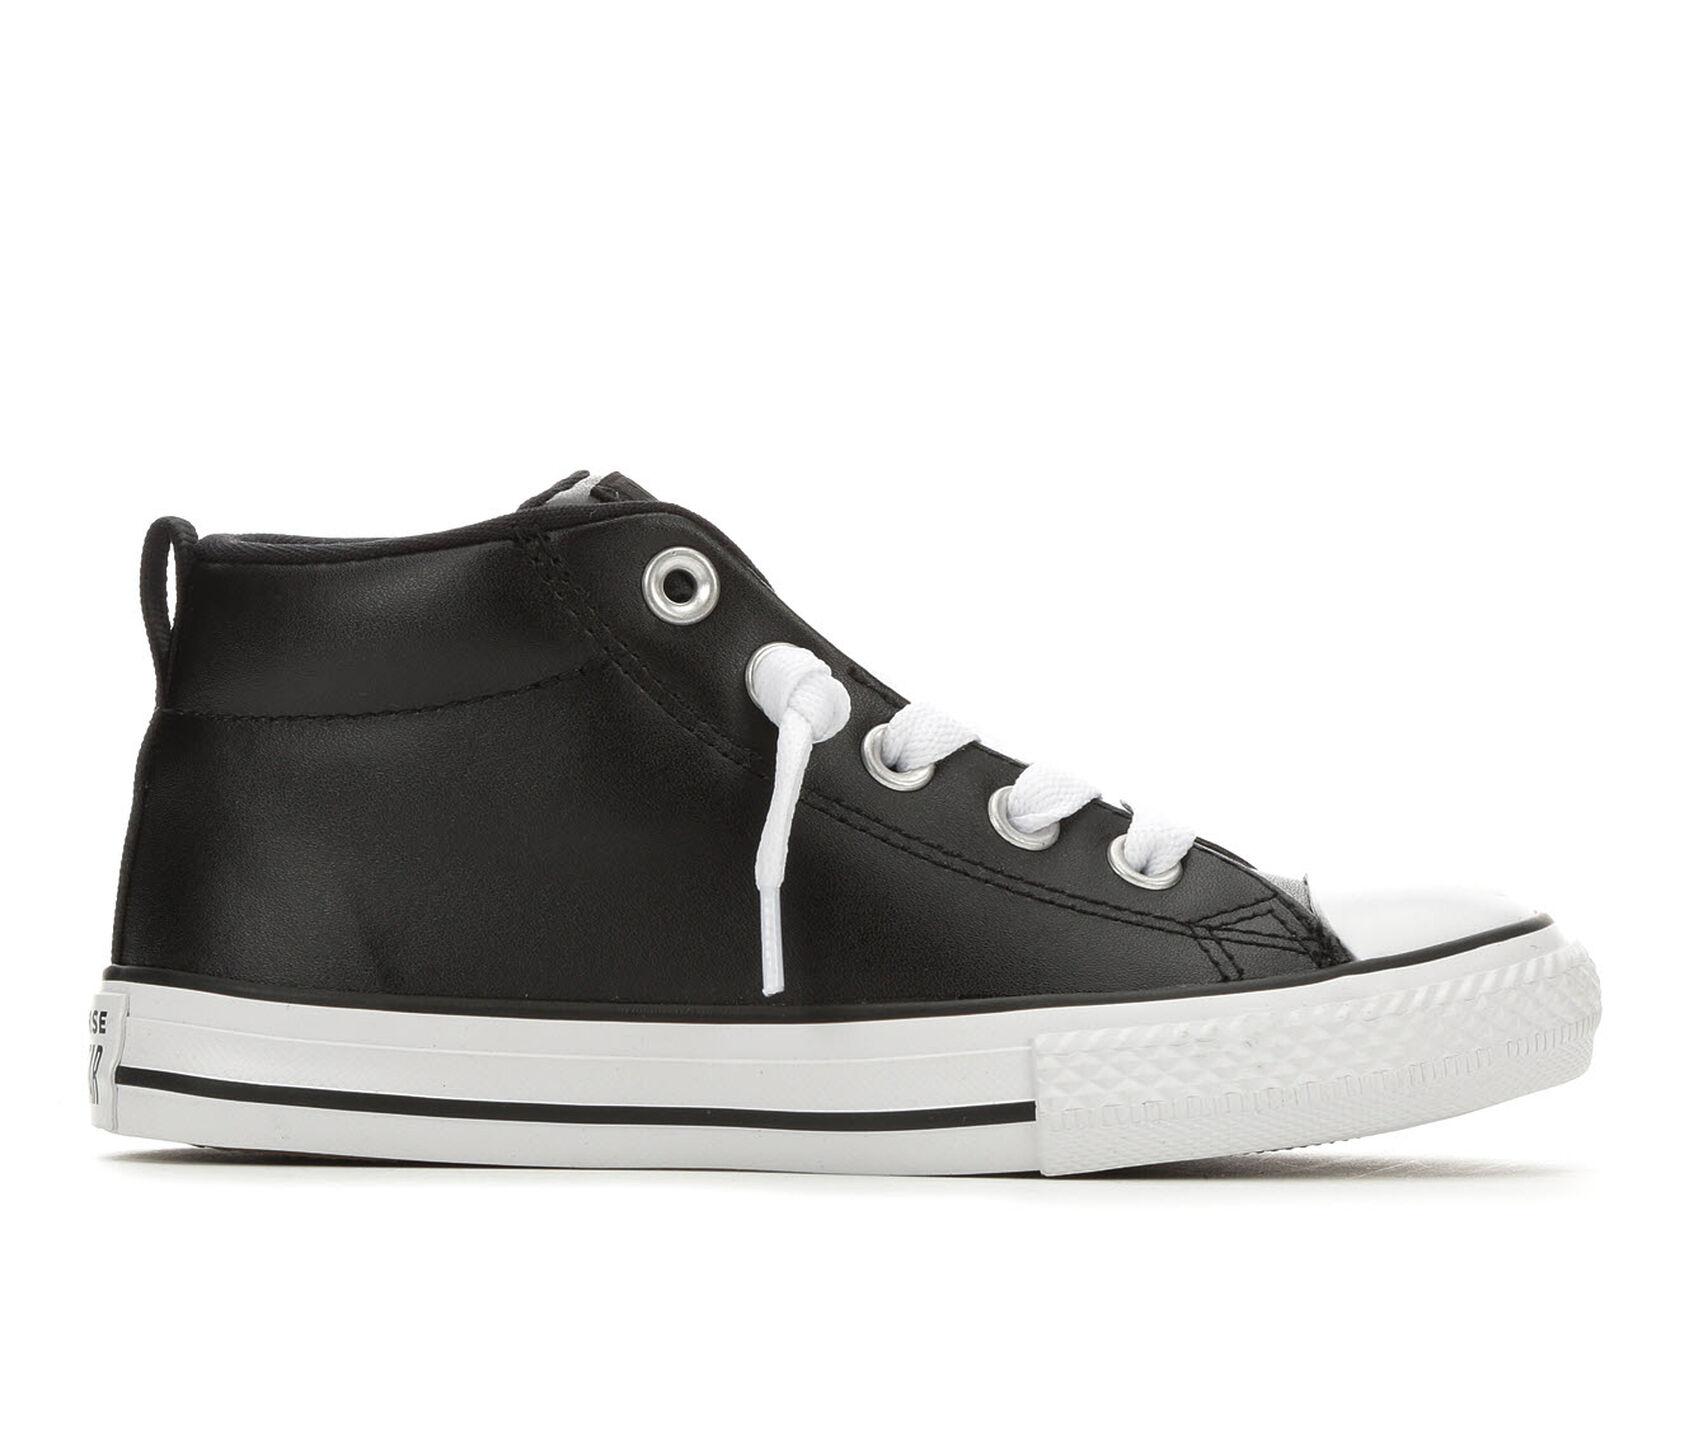 81c8ec0f764 Boys  Converse Little Kid   Big Kid CTAS Street Mid Sneakers